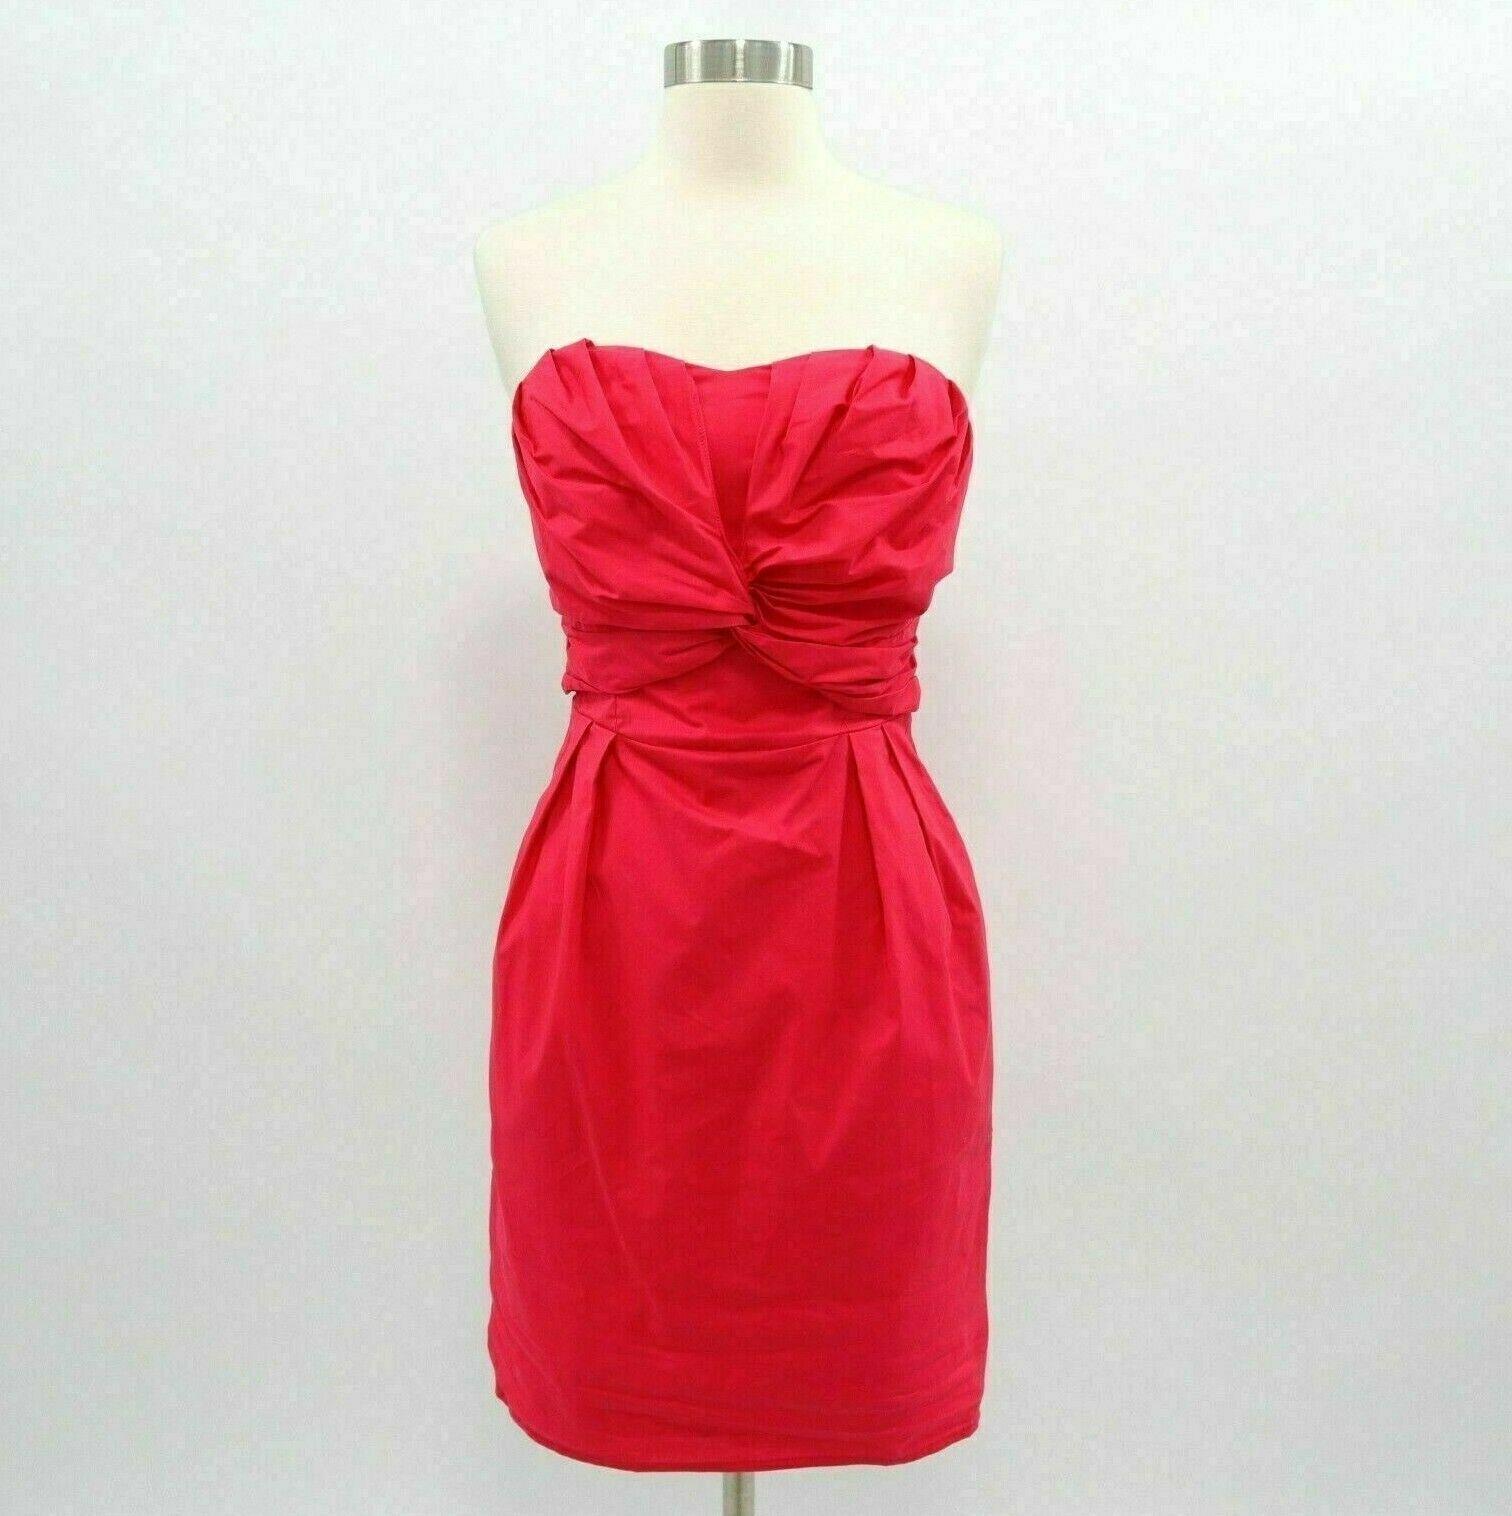 Coast Cocktail Dress damen 6 Strapless Hot Rosa Tie Waist Bow Knotted Pockets